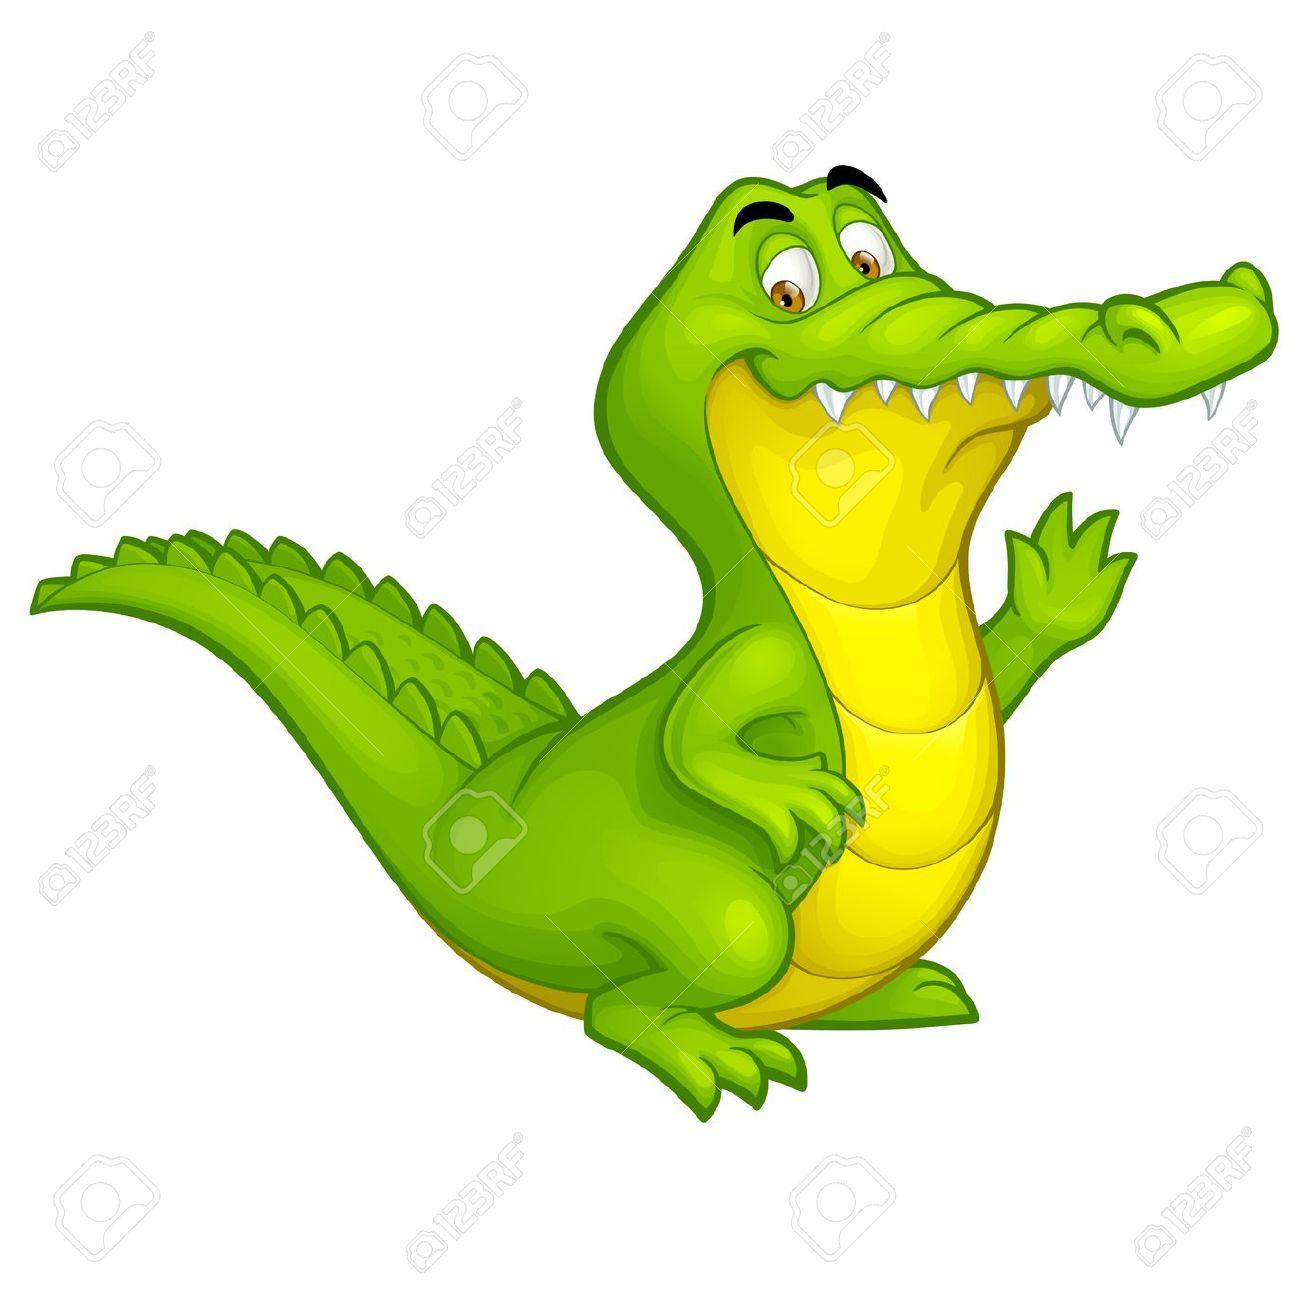 1300x1300 Cute Crocodile Illustration